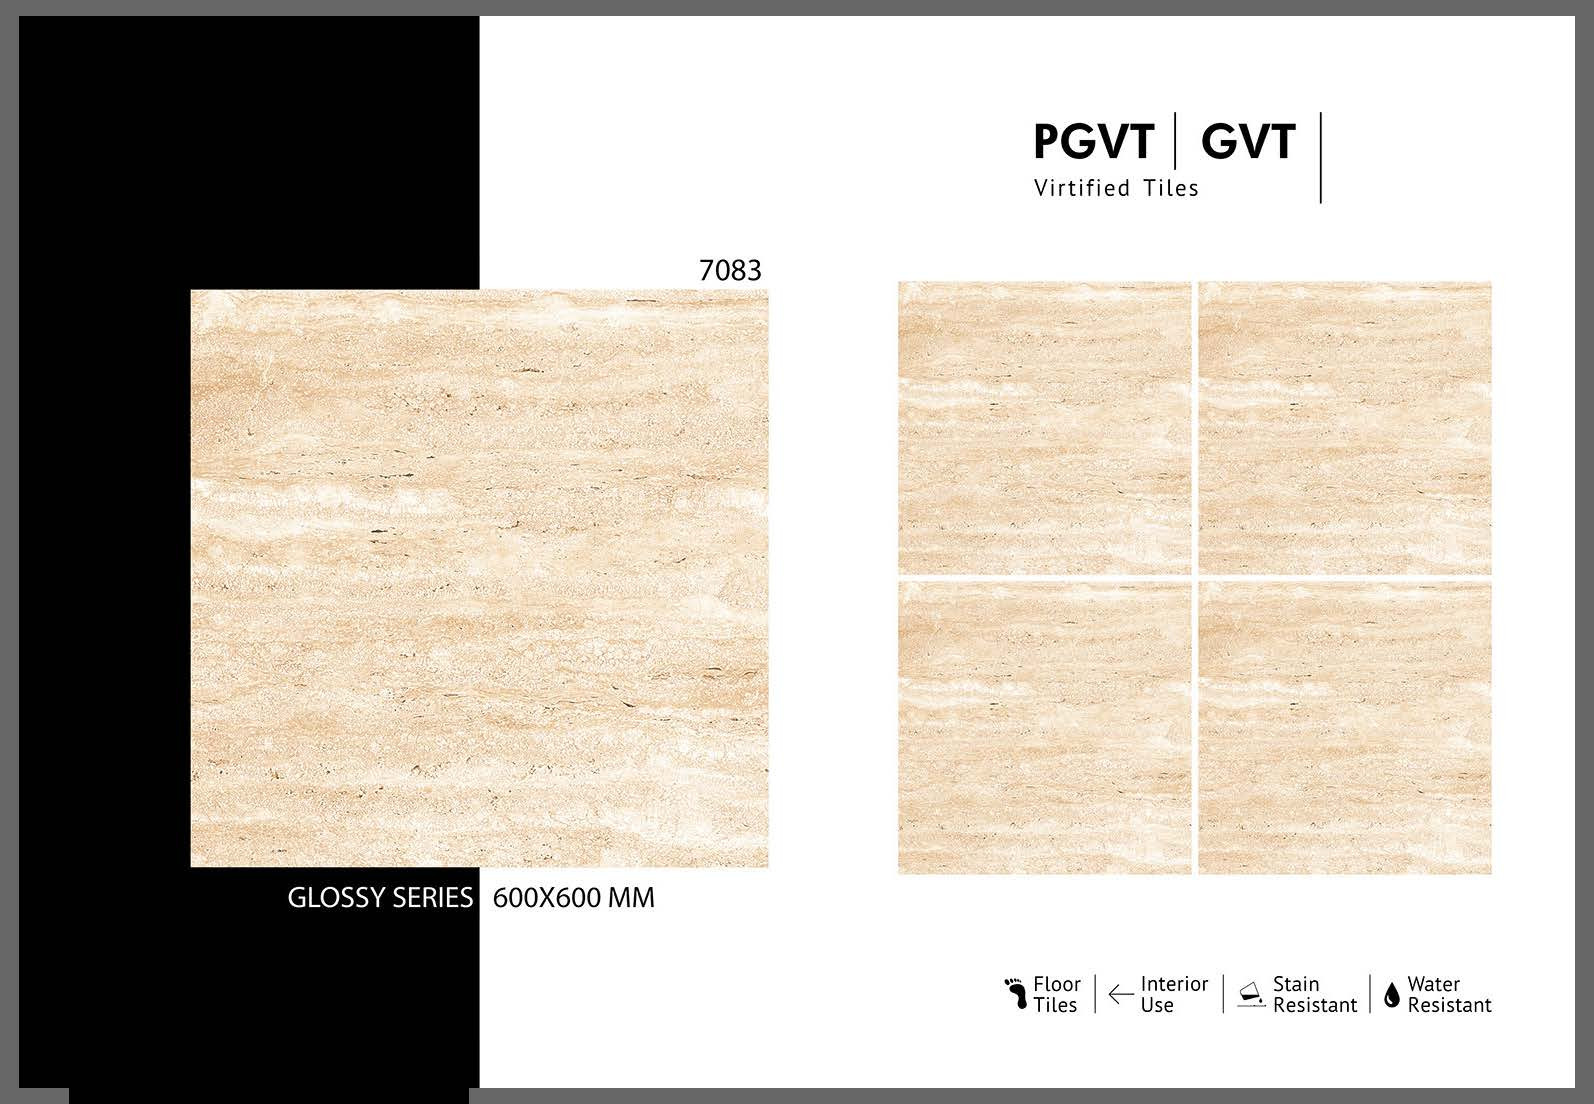 GVT 2X2 GLOSSY_Page_70.jpg